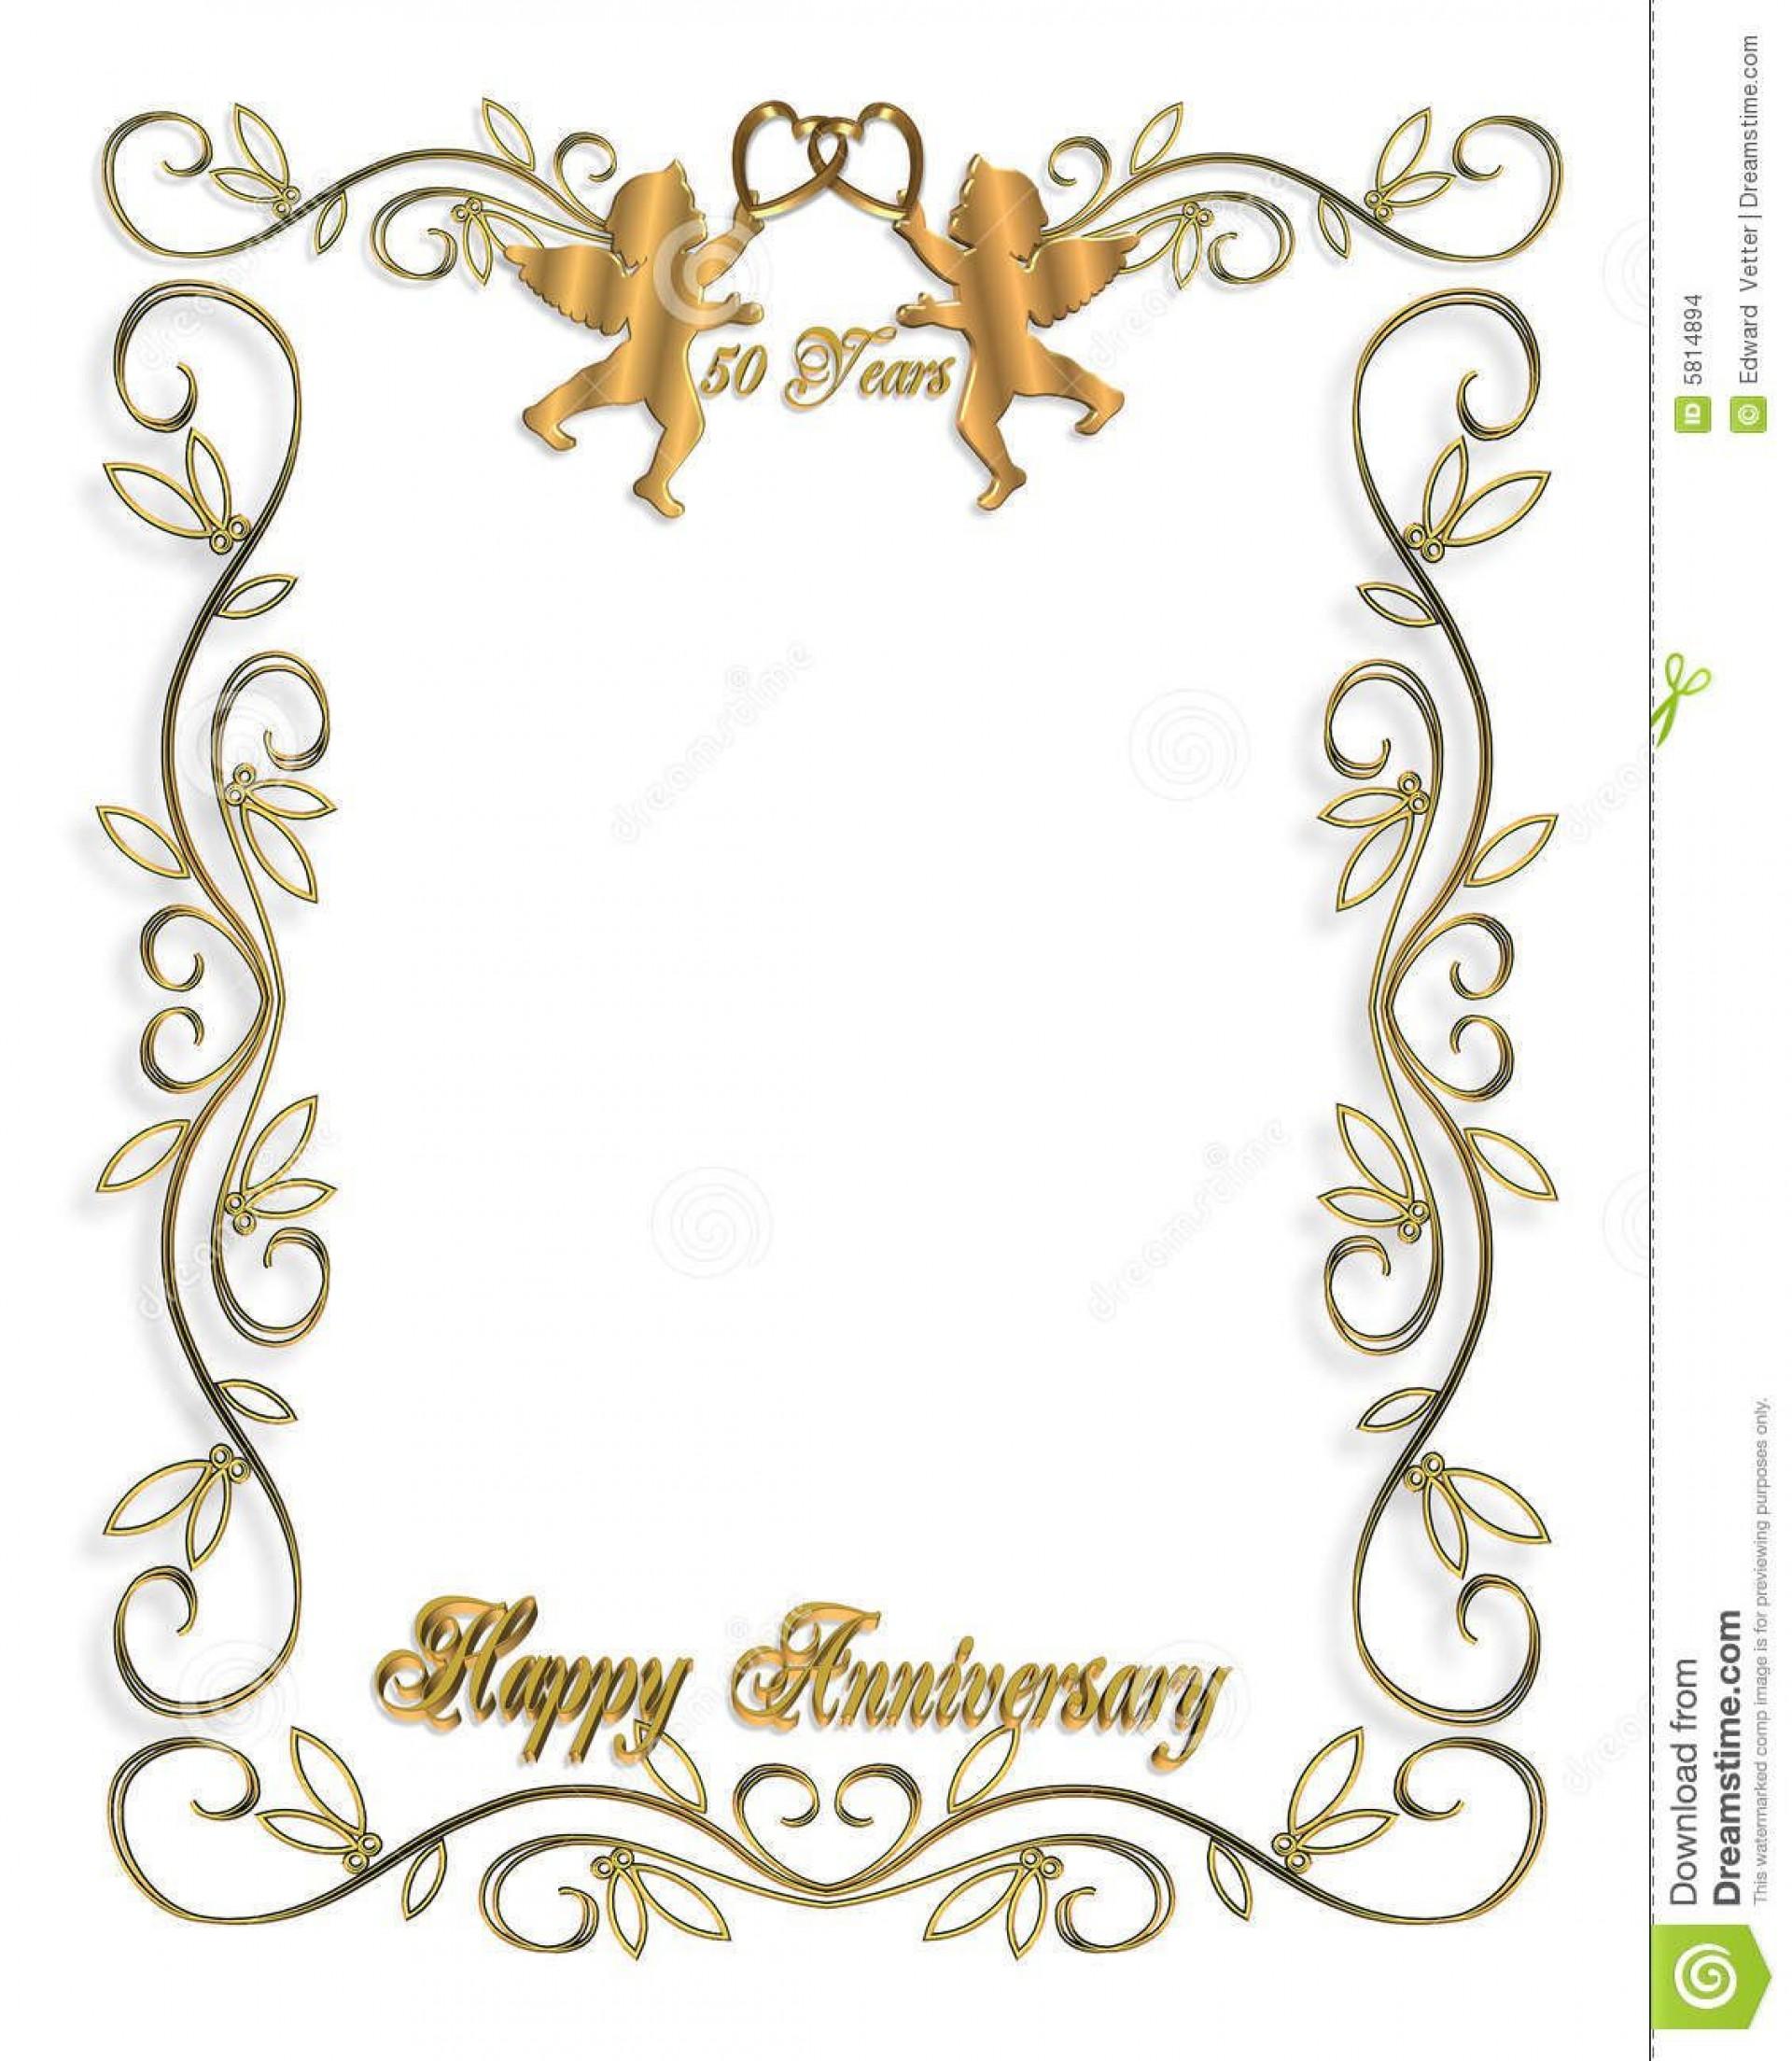 010 Striking 50th Anniversary Invitation Template Free Design  Download Golden Wedding1920